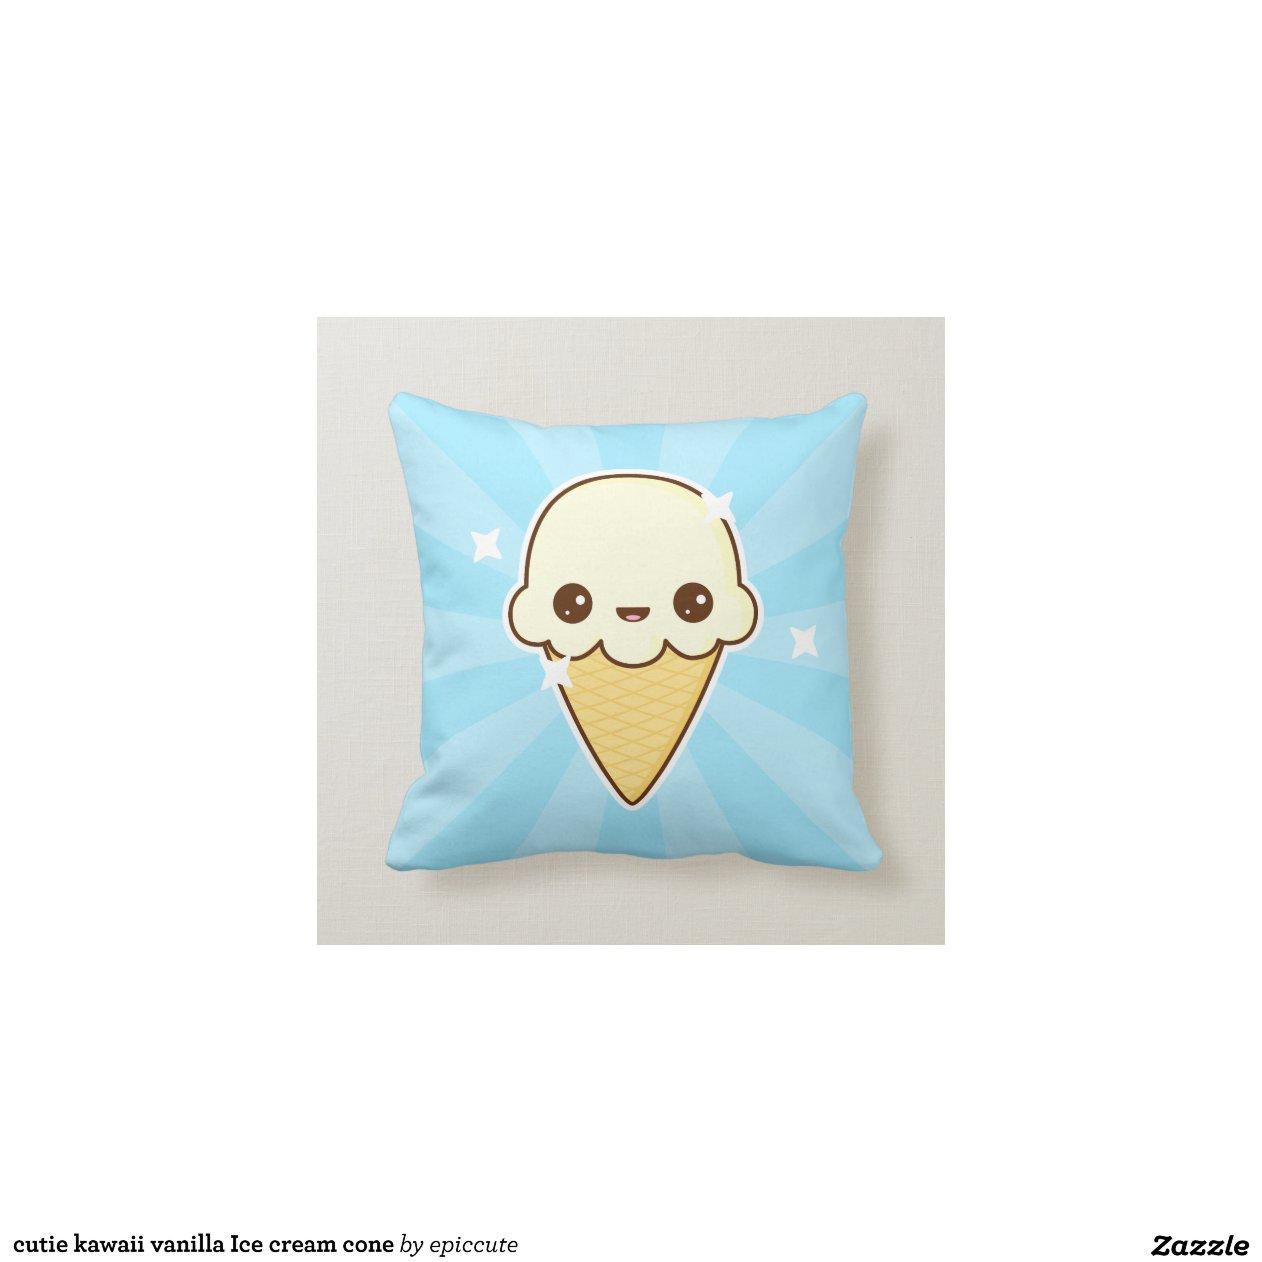 Ice Cream Throw Pillows : cutie_kawaii_vanilla_ice_cream_cone_throw_pillows-rdcb0646737ea400a9b8fd0356344104c_i5fqz_8byvr ...